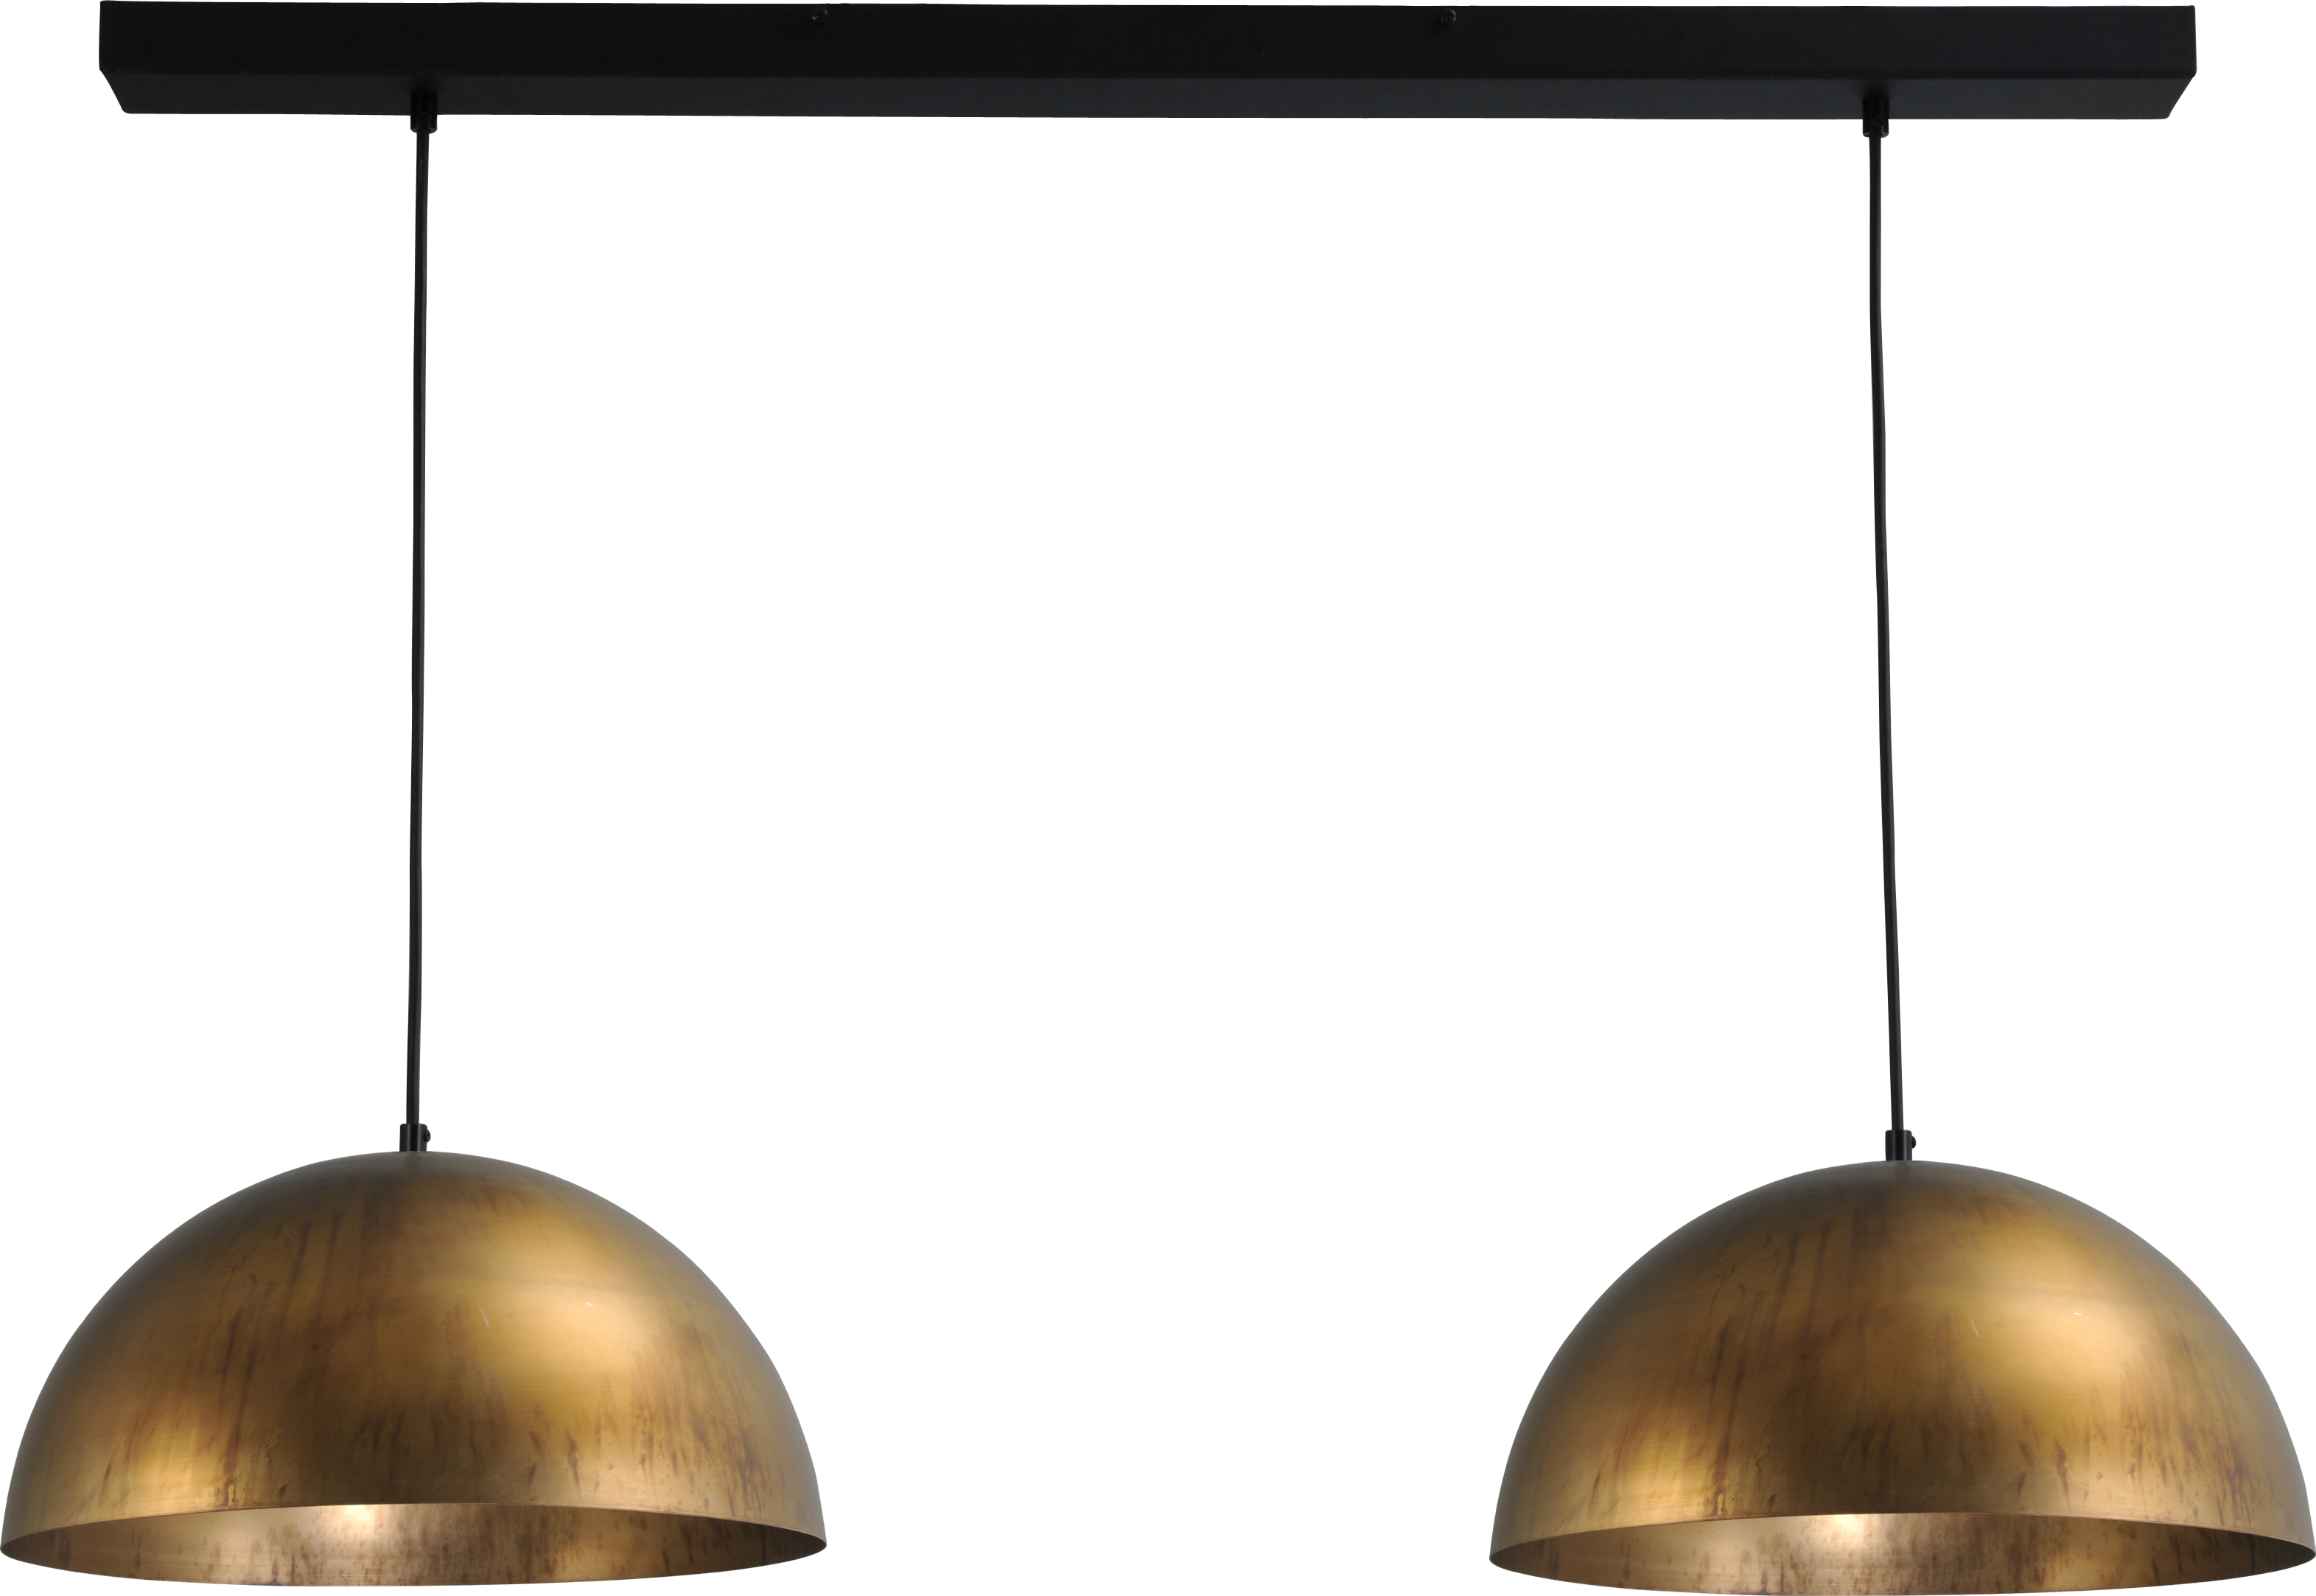 Larino Antique Brass HL LARINO 2LTS Ø40CM ANTIQUE BRASS/ANTIQUE BRASS